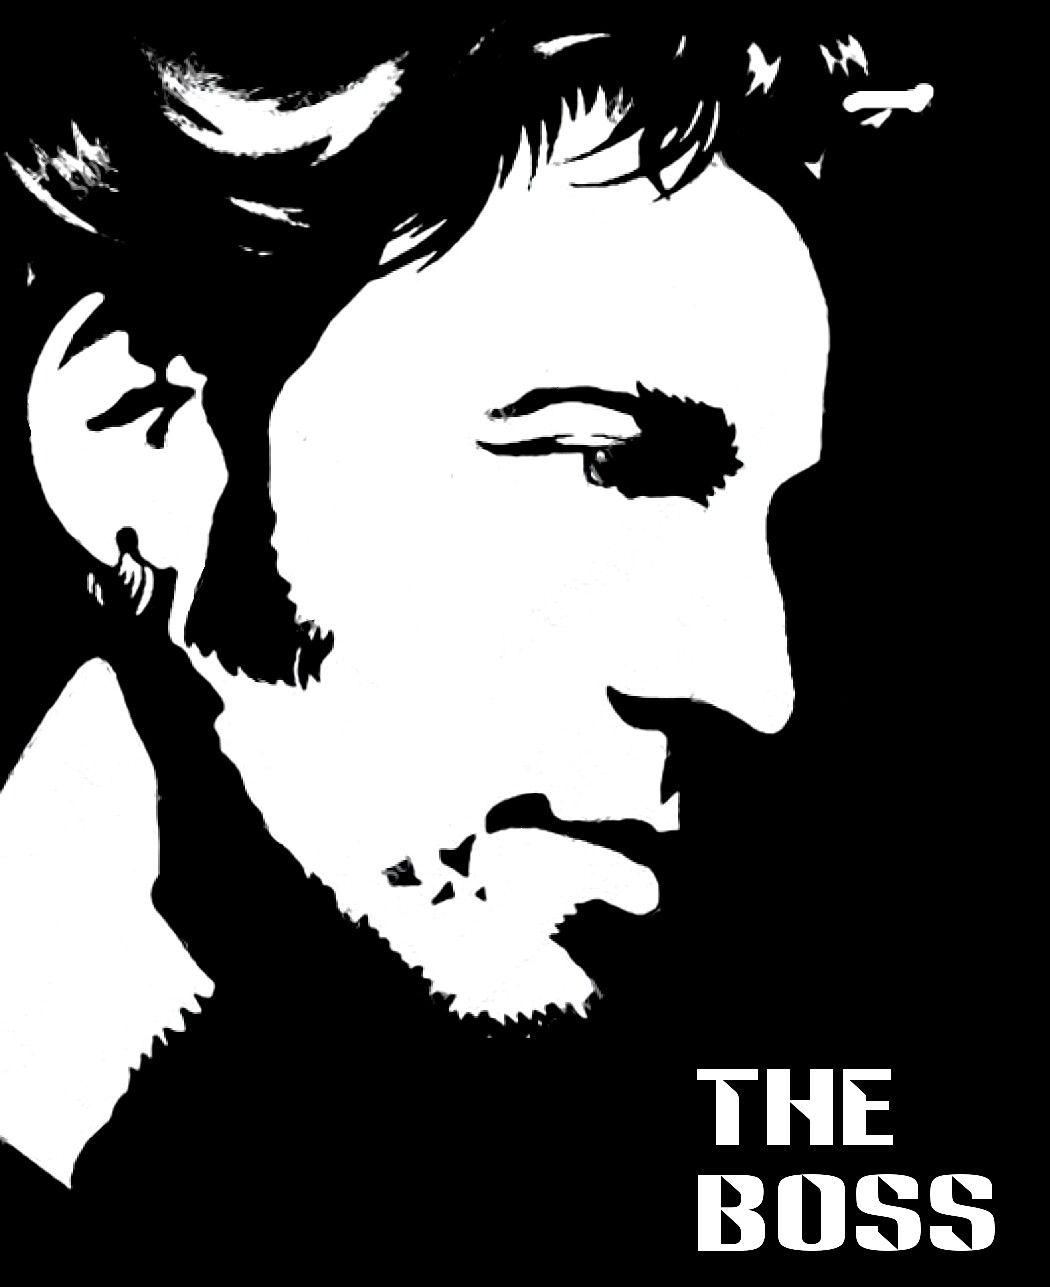 Bruce Springsteen Inspiration Vinyl Record Art Musician Art Bruce Springsteen The Boss